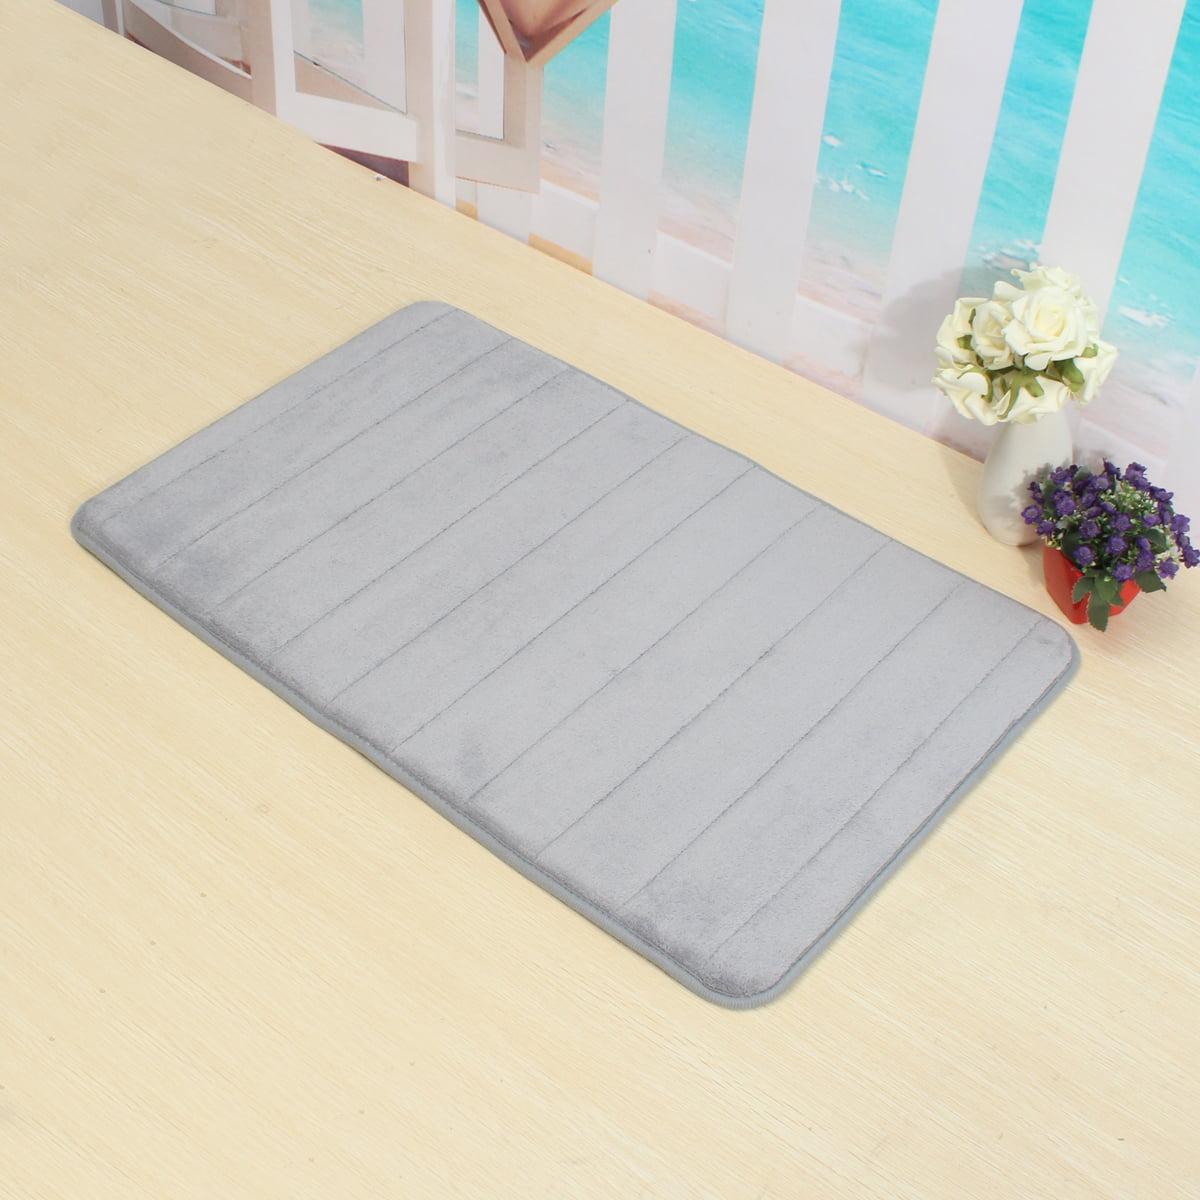 "24""x16"" Microfibre Bath Doormat Rug Memory Foam Mat Bathroom Shower Bedroom Carpet With Non Slip Back - 11 Colours"